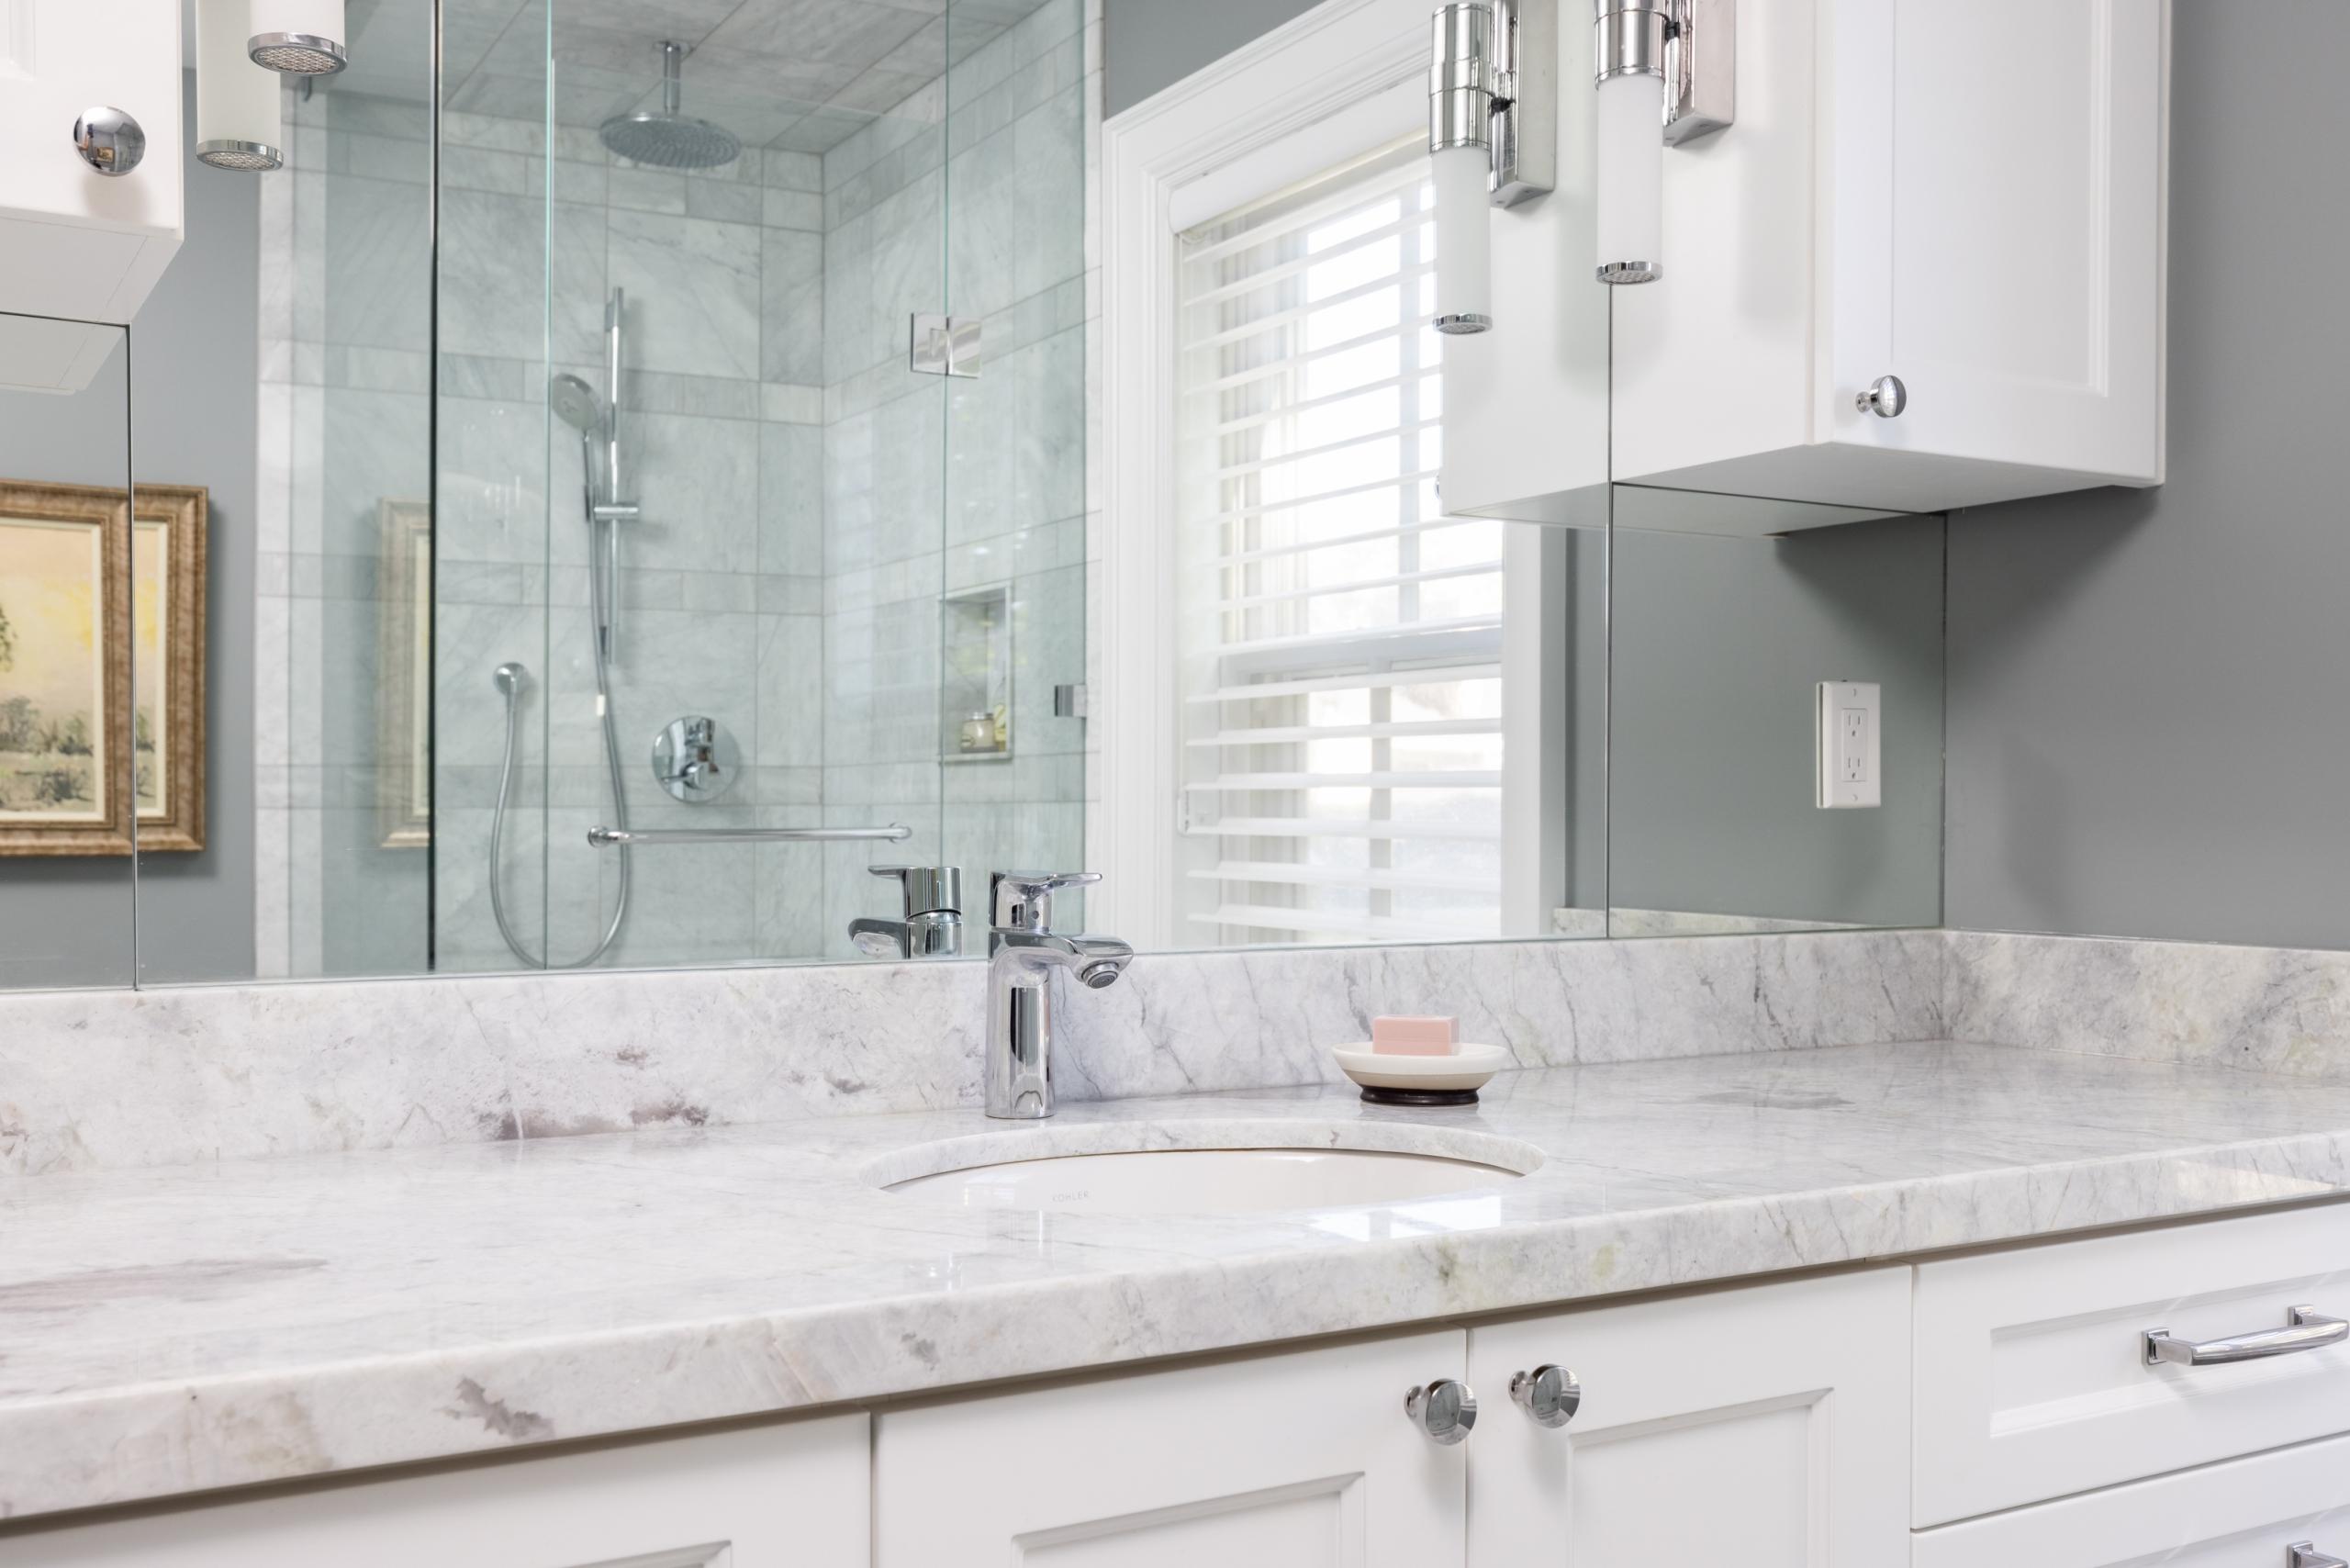 Bathroom featured at 295 William Street, Oakville. Alex Irish & Associates